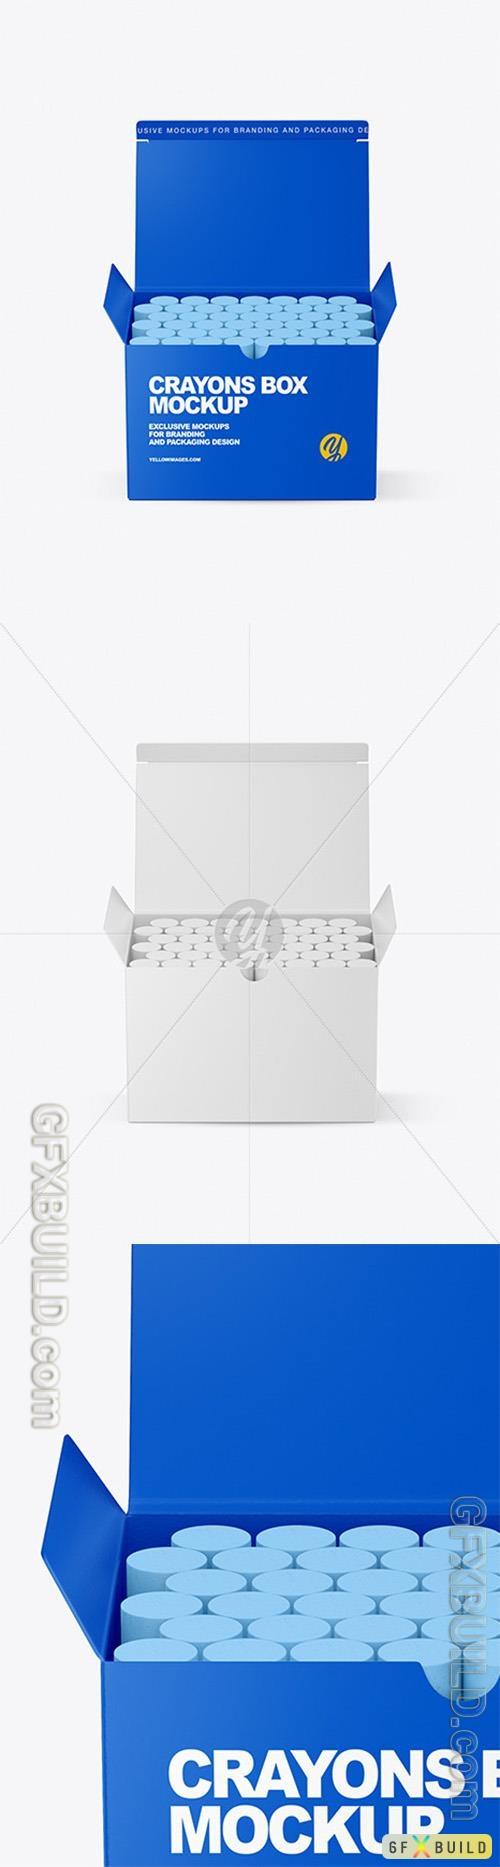 Paper Box with Crayons Mockup 89406